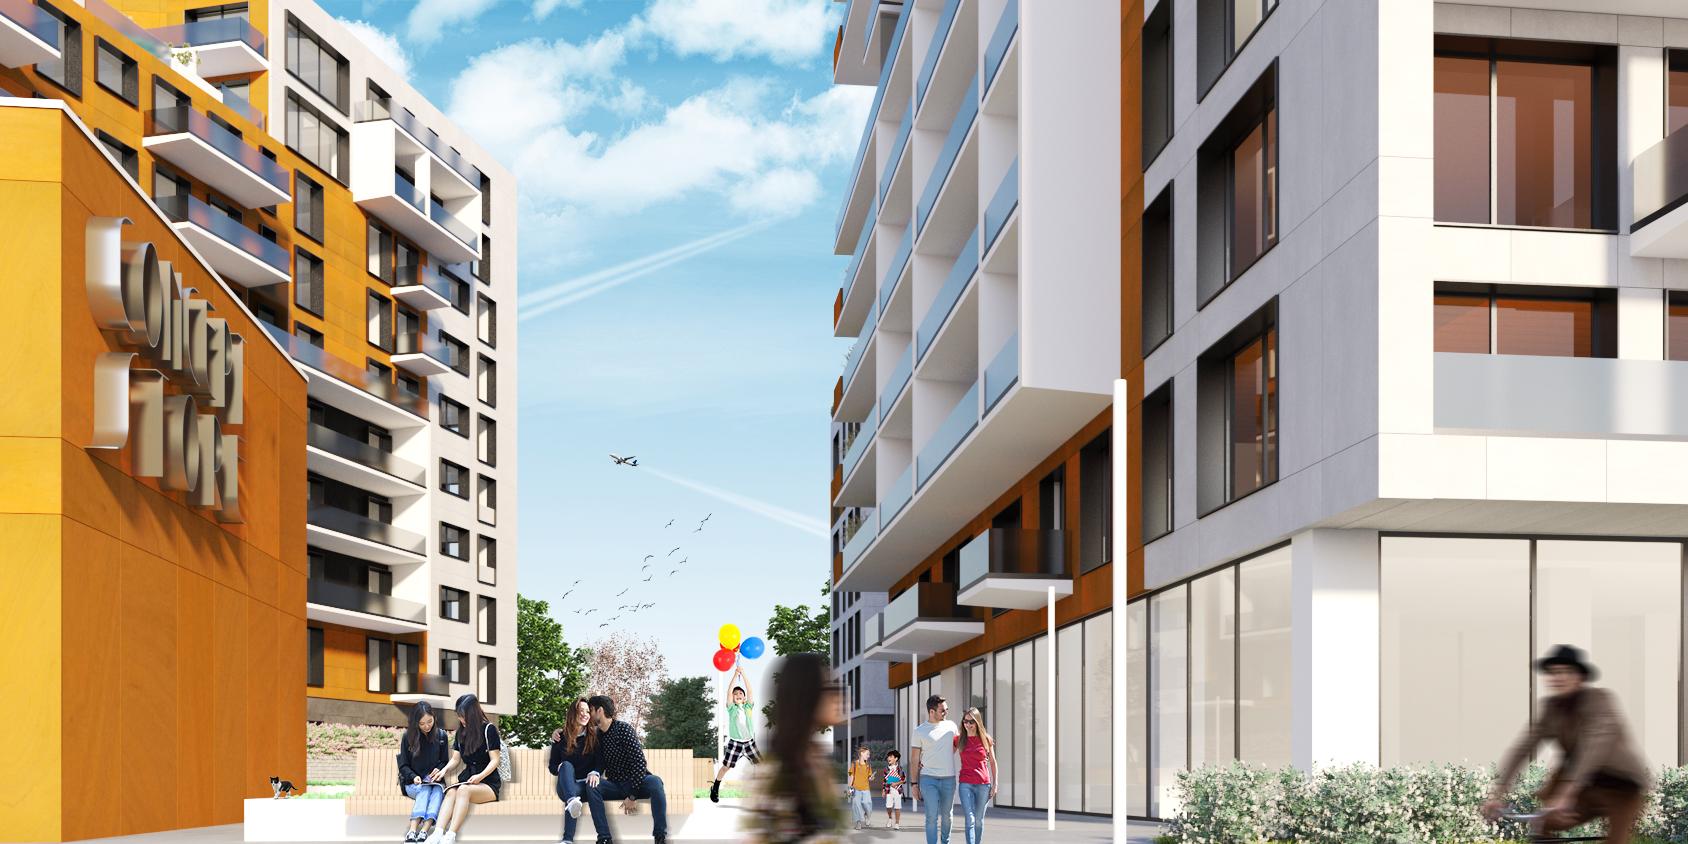 https://nbc-arhitect.ro/wp-content/uploads/2020/10/NBC-Arhitect-_-residentials-_-Glucoza-Residence-2-_-Bucharest-Romania_8.jpg